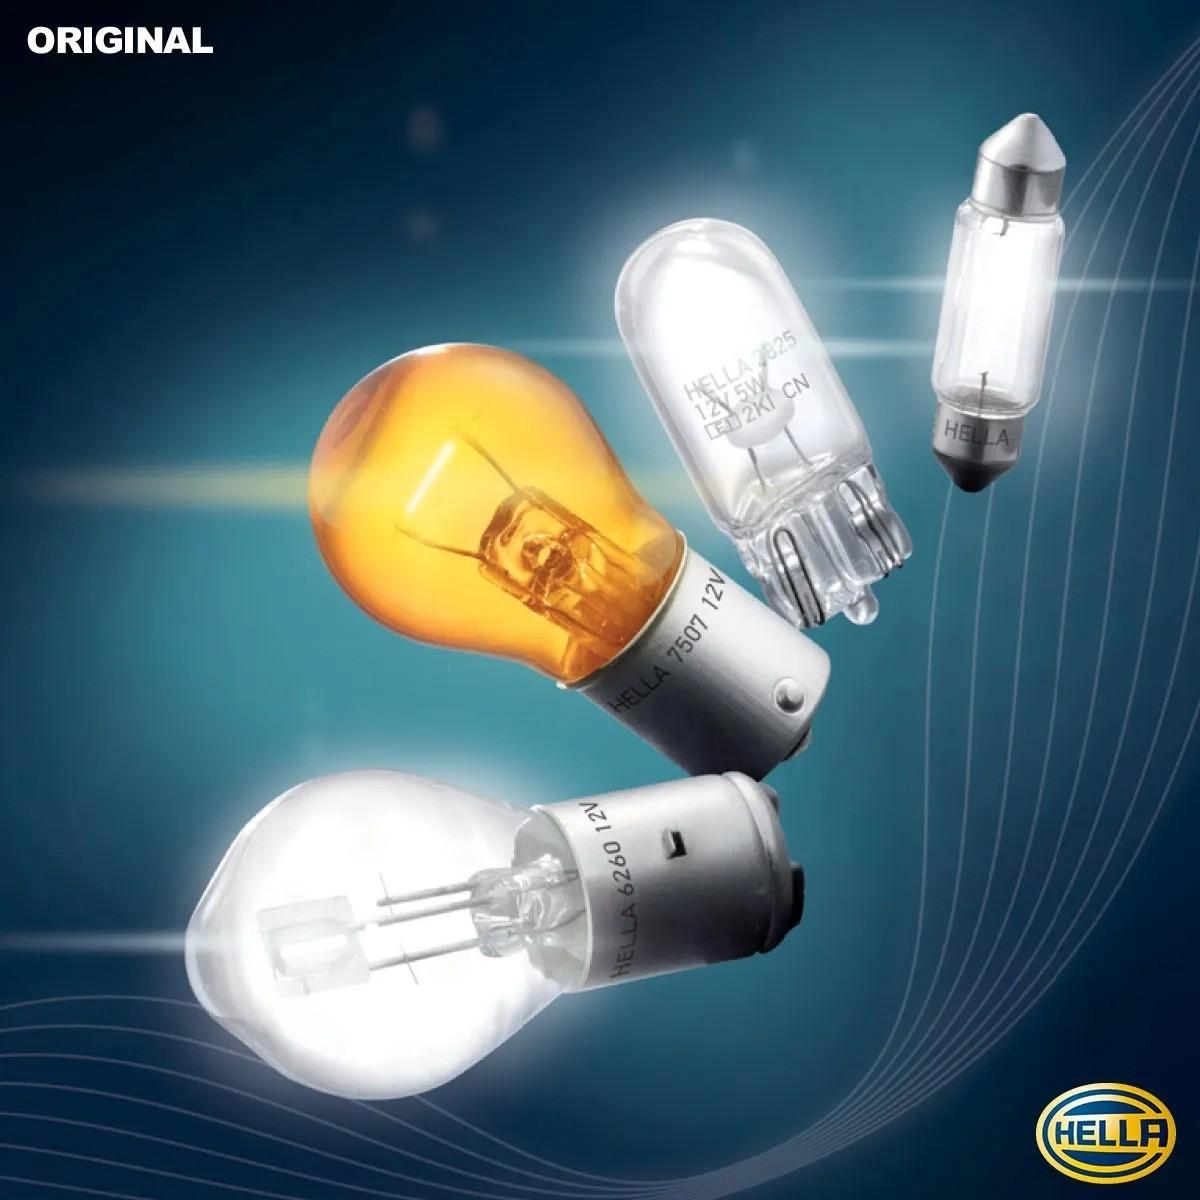 LAMPADA CONVENCIONAL 12V 12V 10W T3.25 38MM TORPEDO UNIVERSAL HELLA